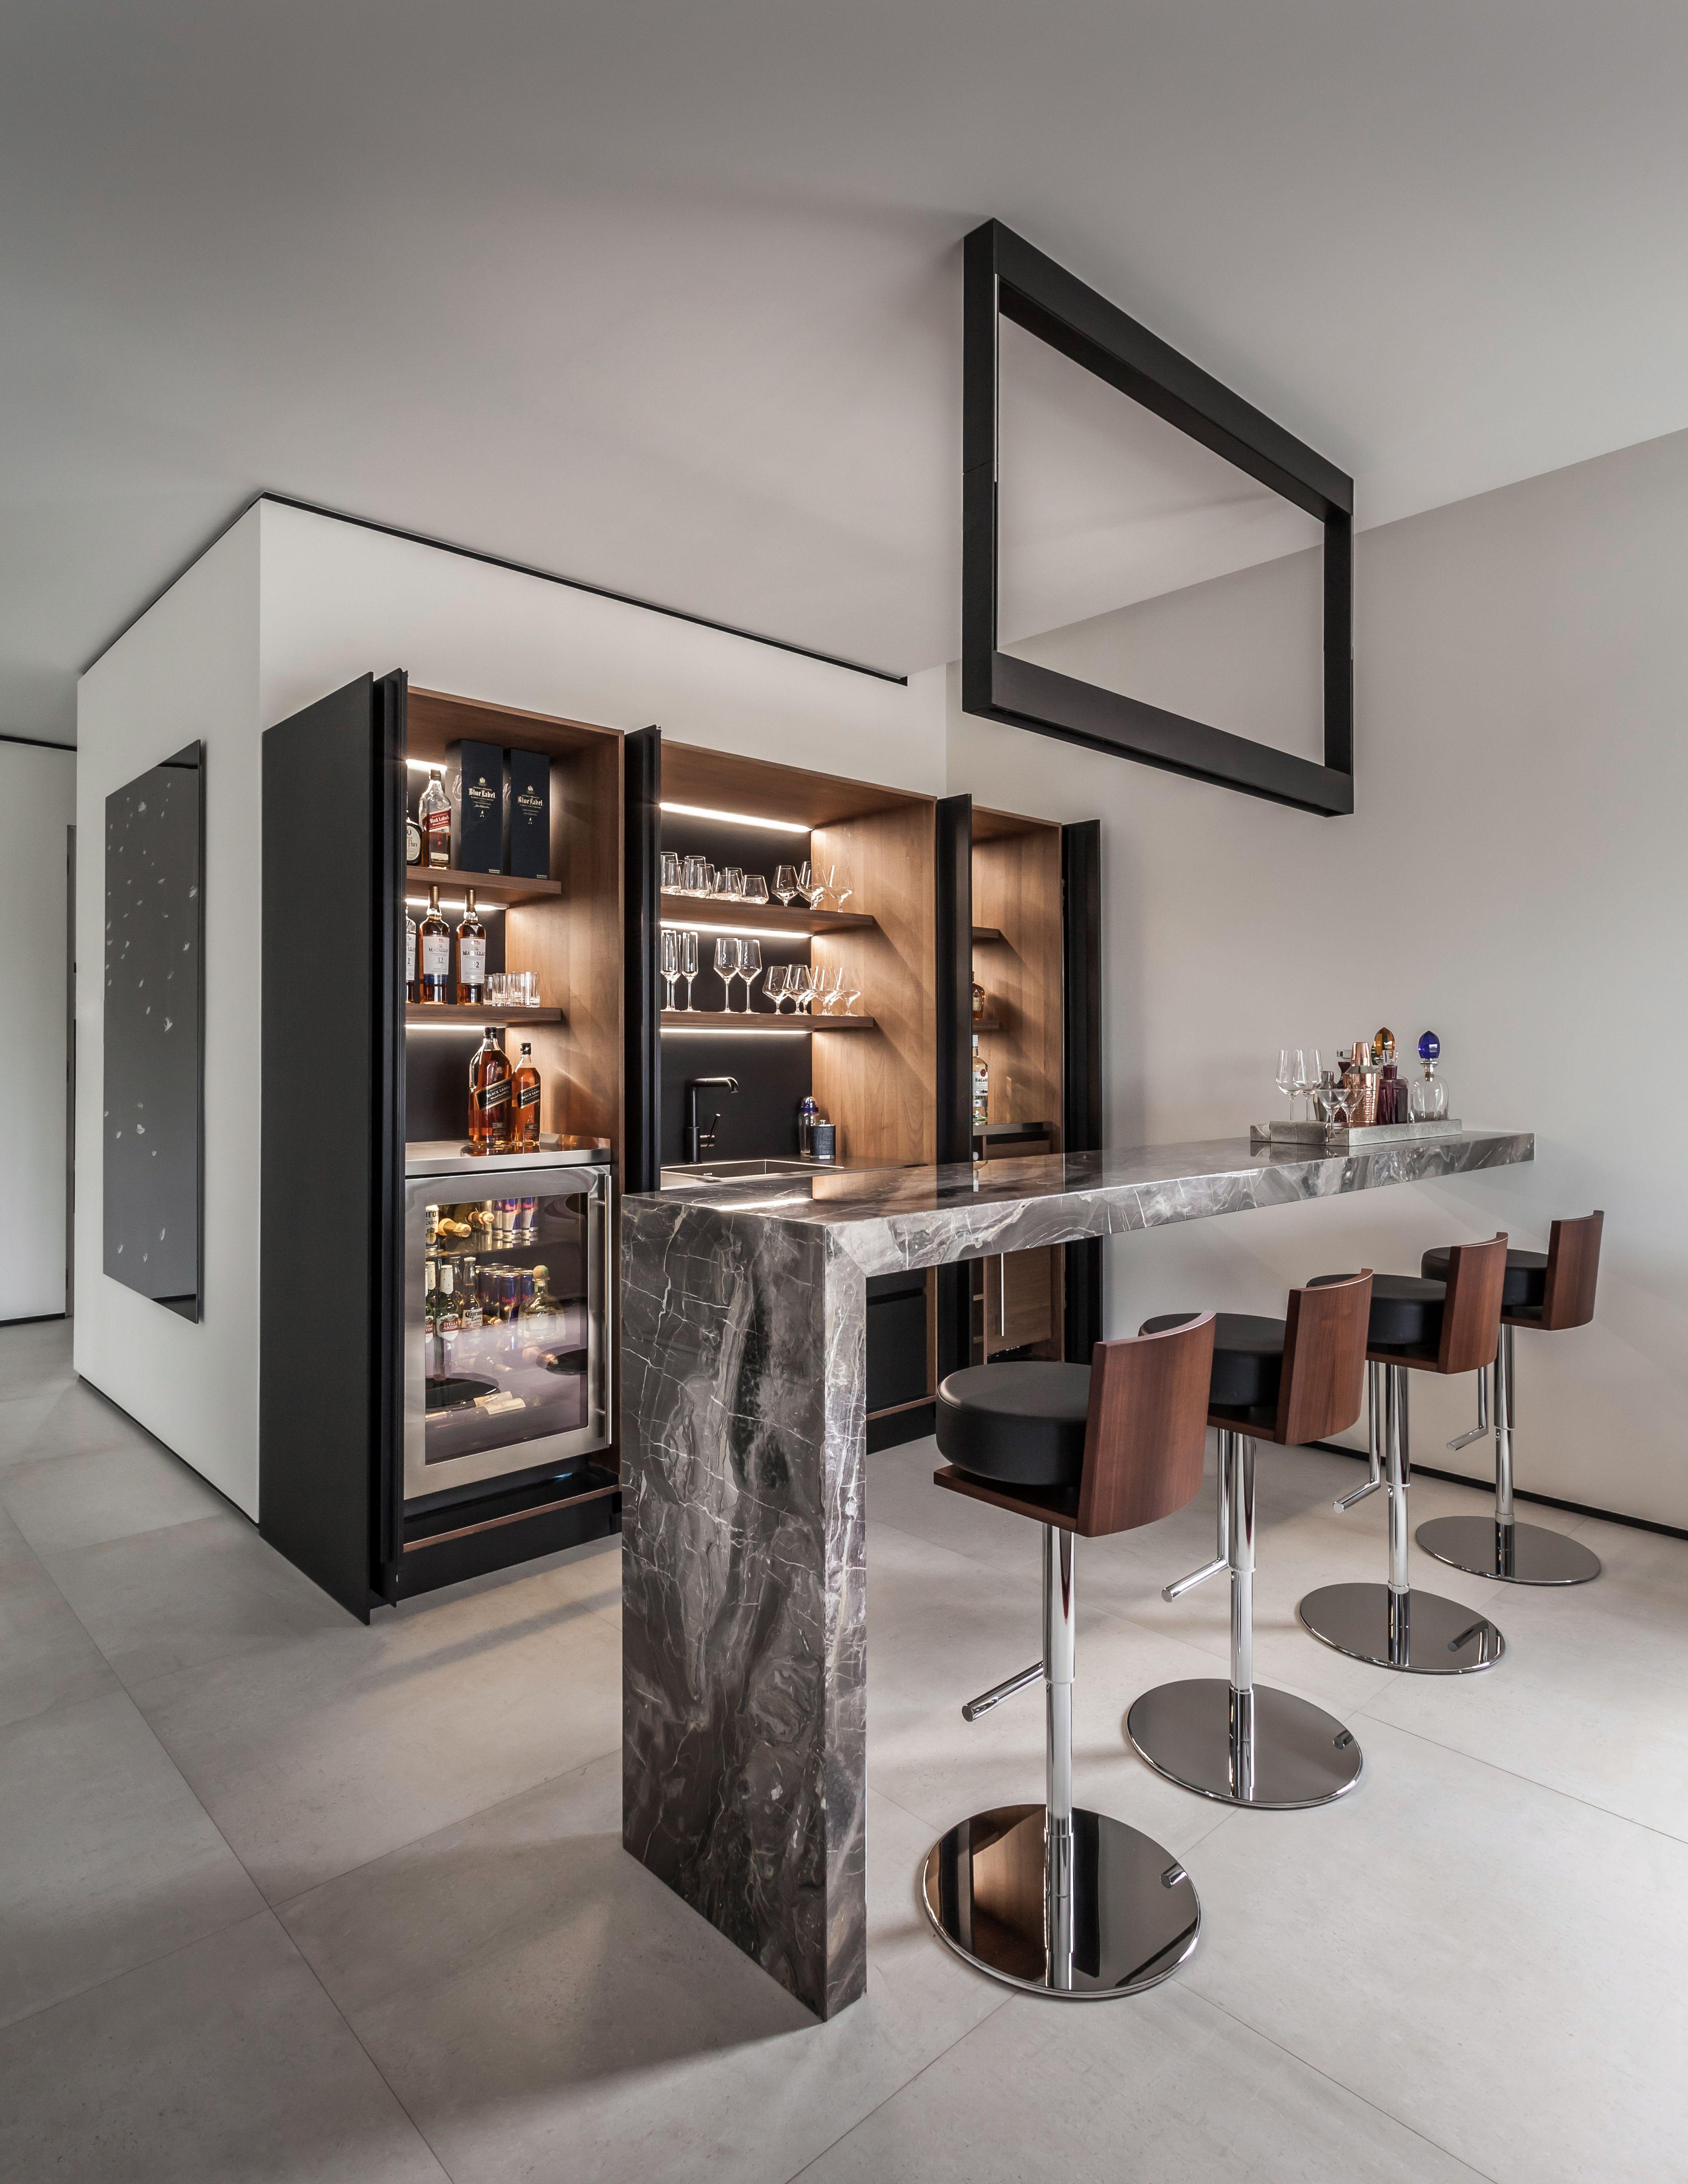 Best Living Room Bar Marble Pendant Light Kreon Cadre Black Power Coated Metal Led Fixture In 2019 400 x 300